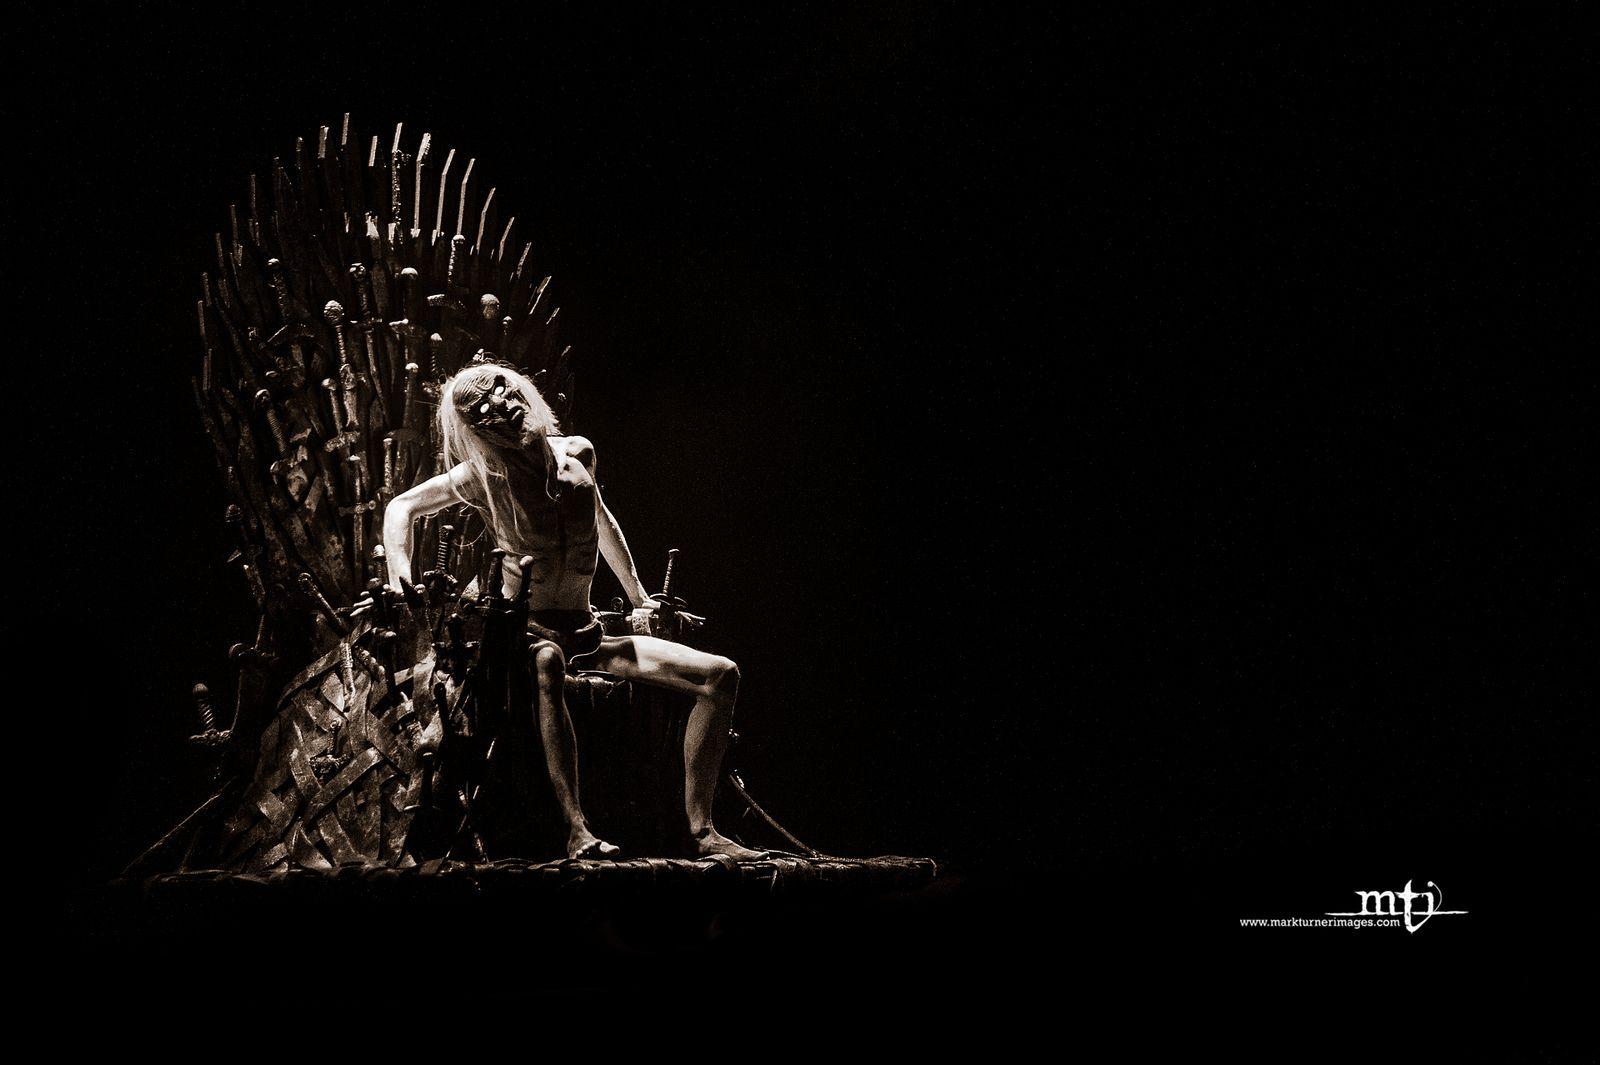 season 7 of game of thrones air date